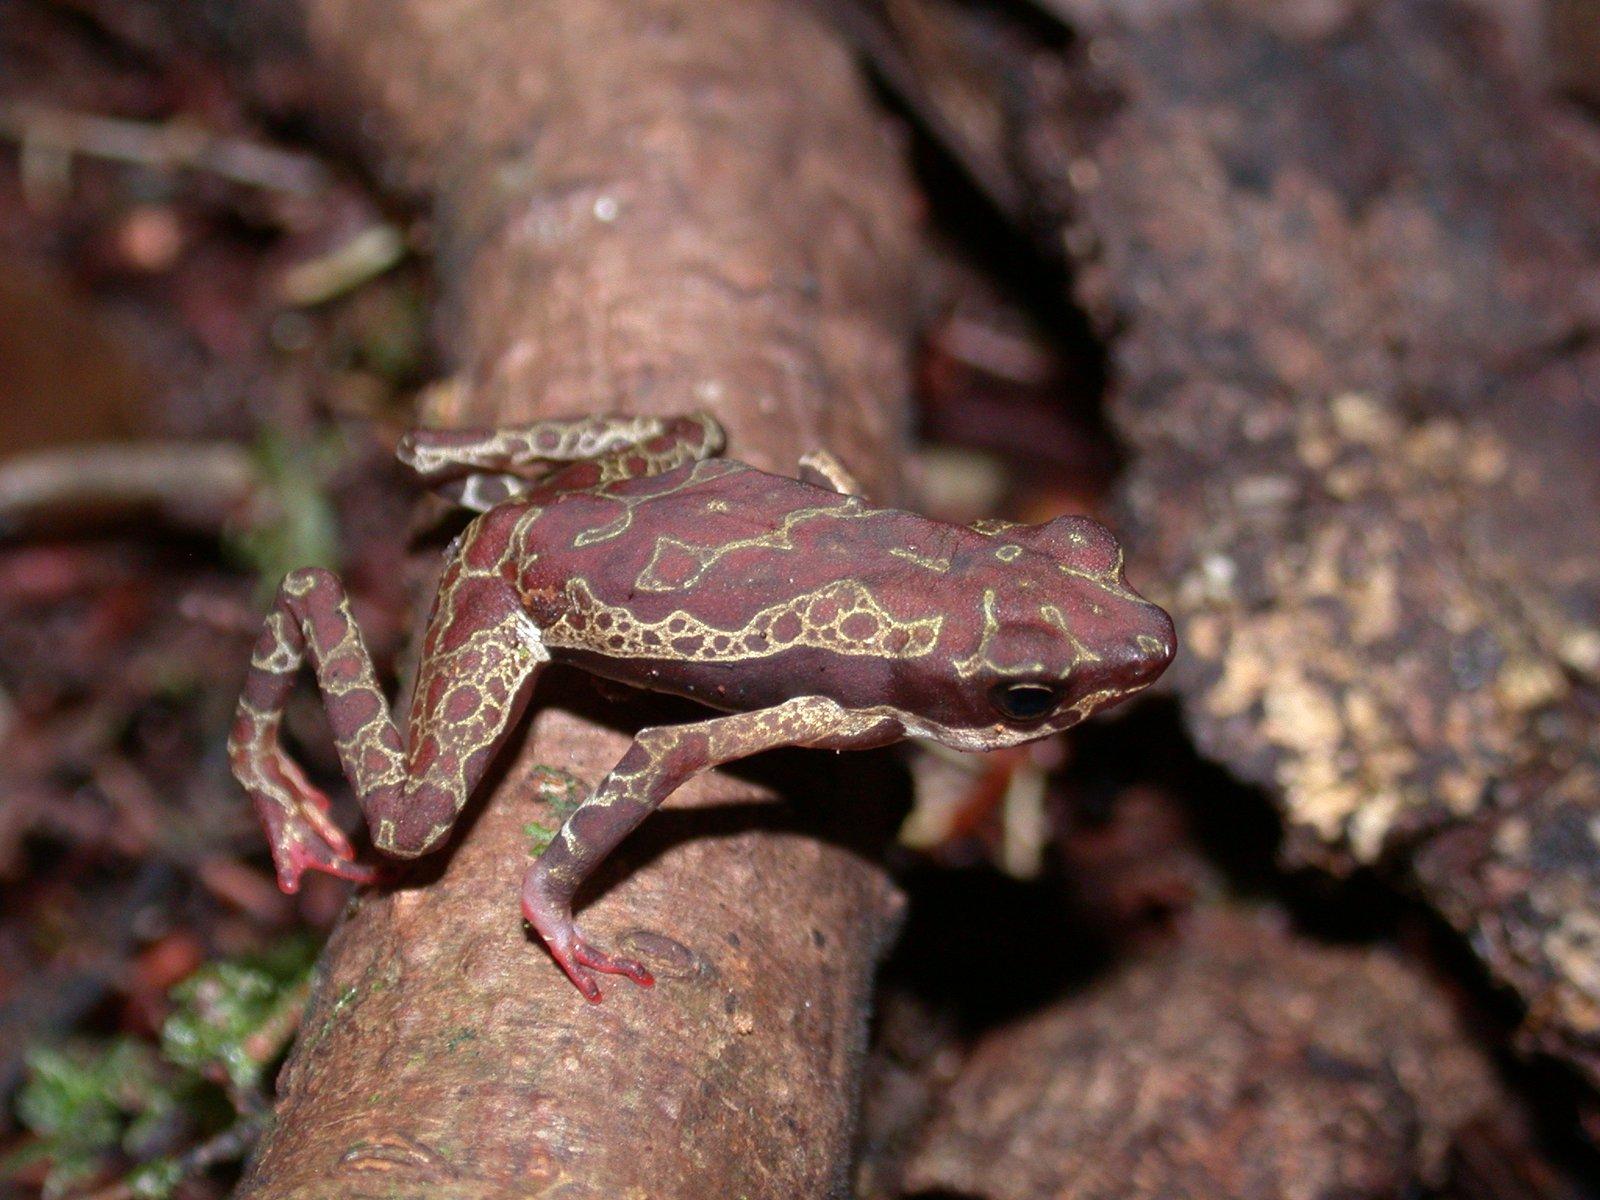 Manauense Harlequin Toad